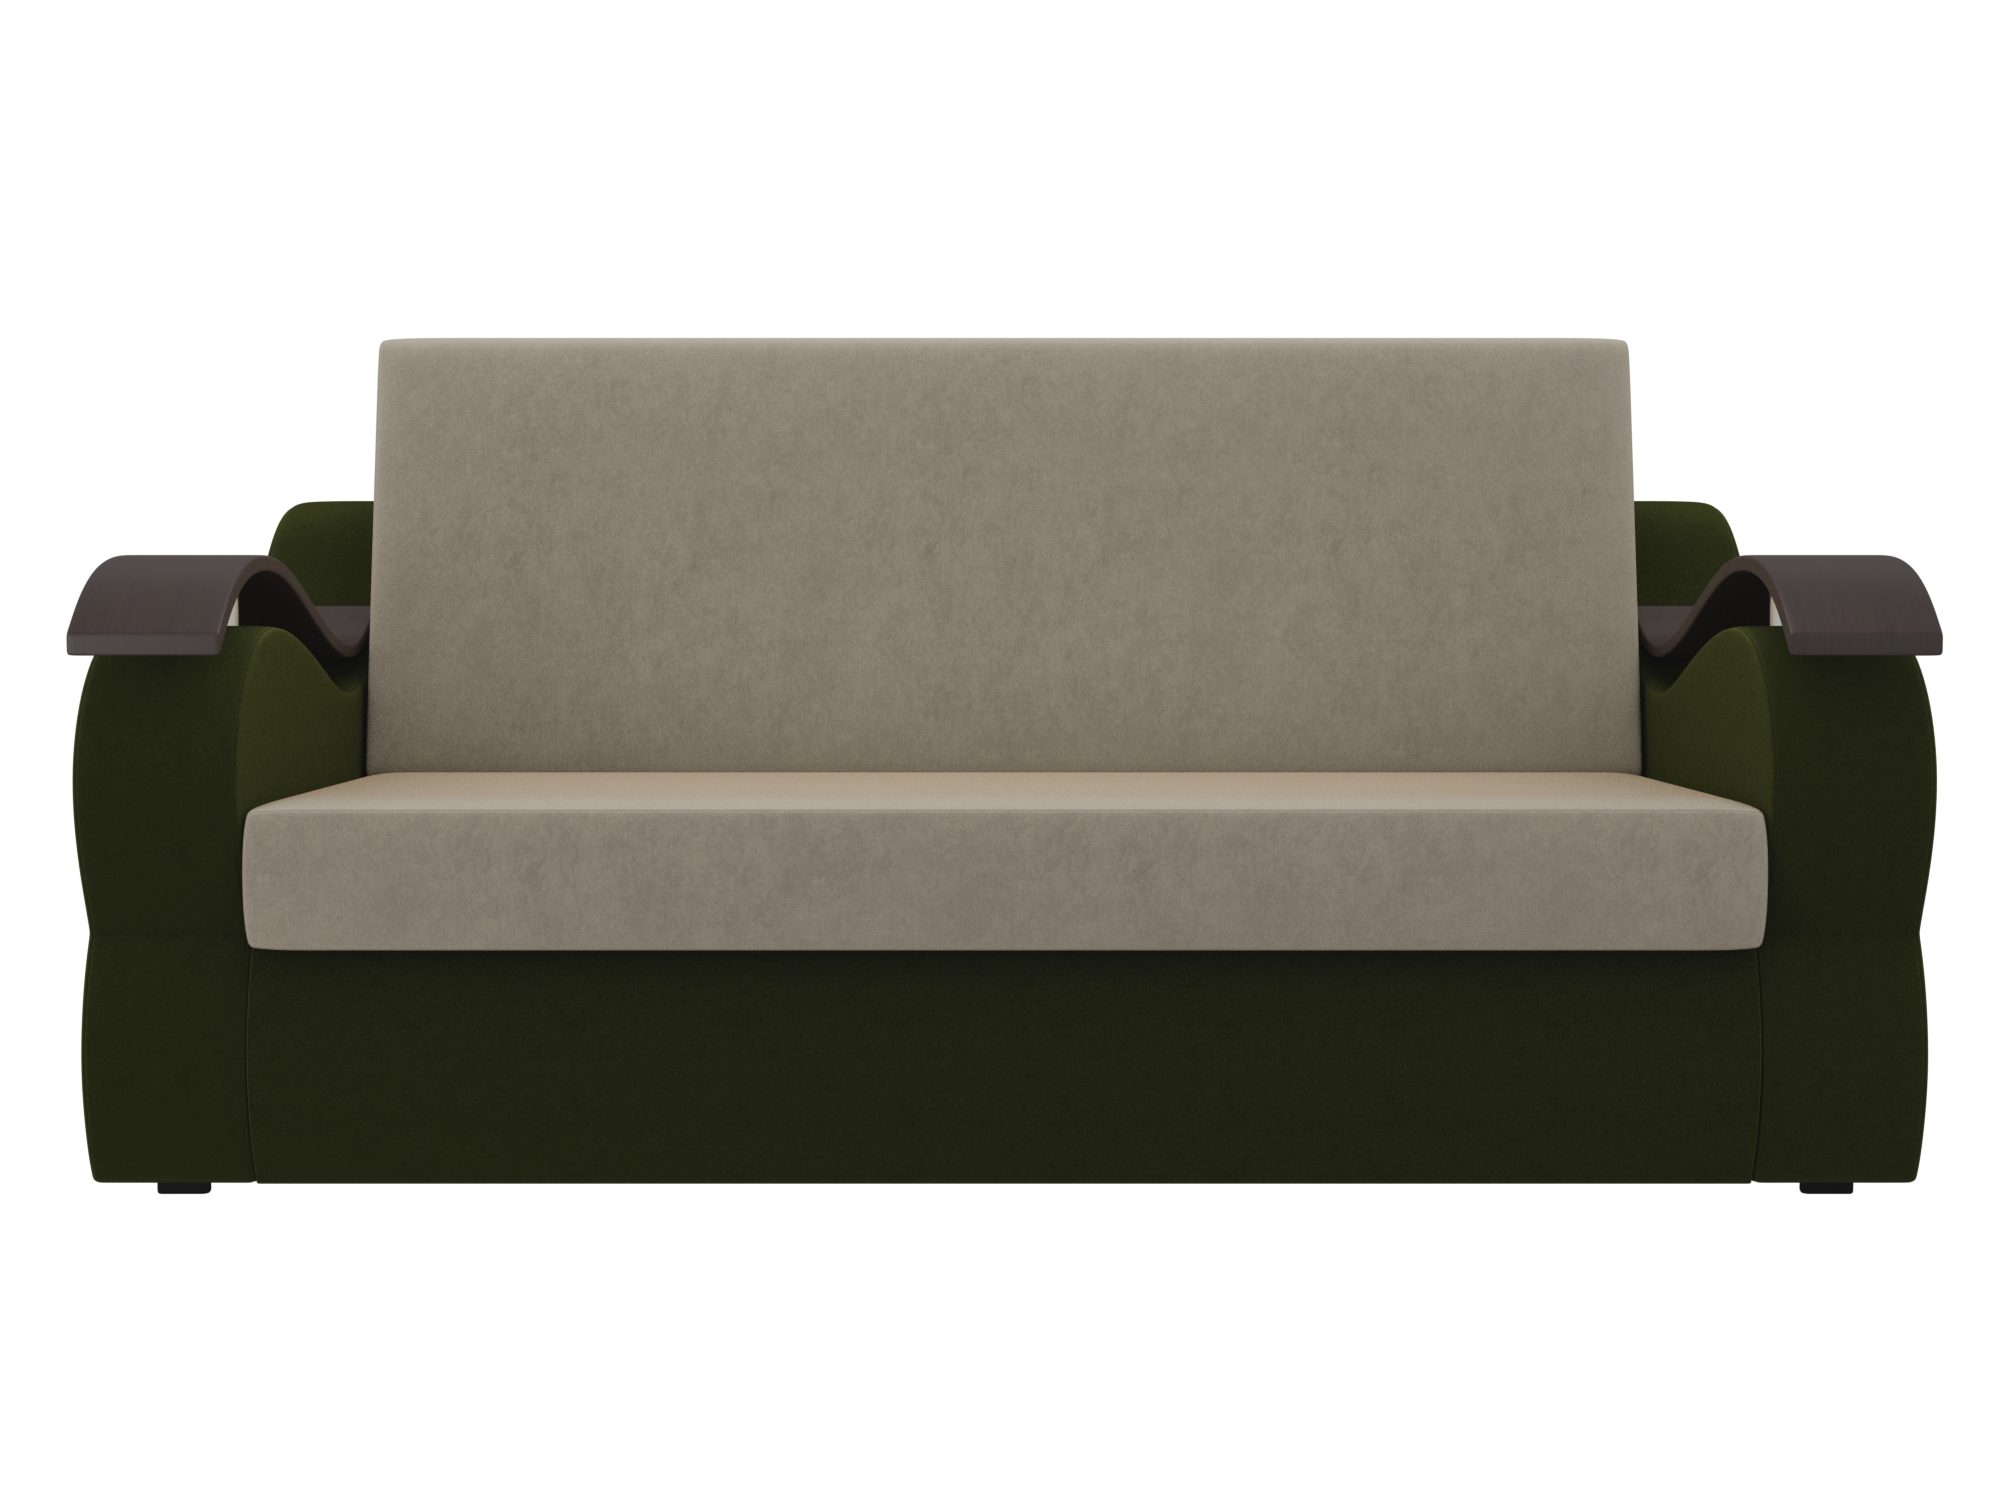 Диван Меркурий (160х190) MebelVia Бежевый, Зеленый